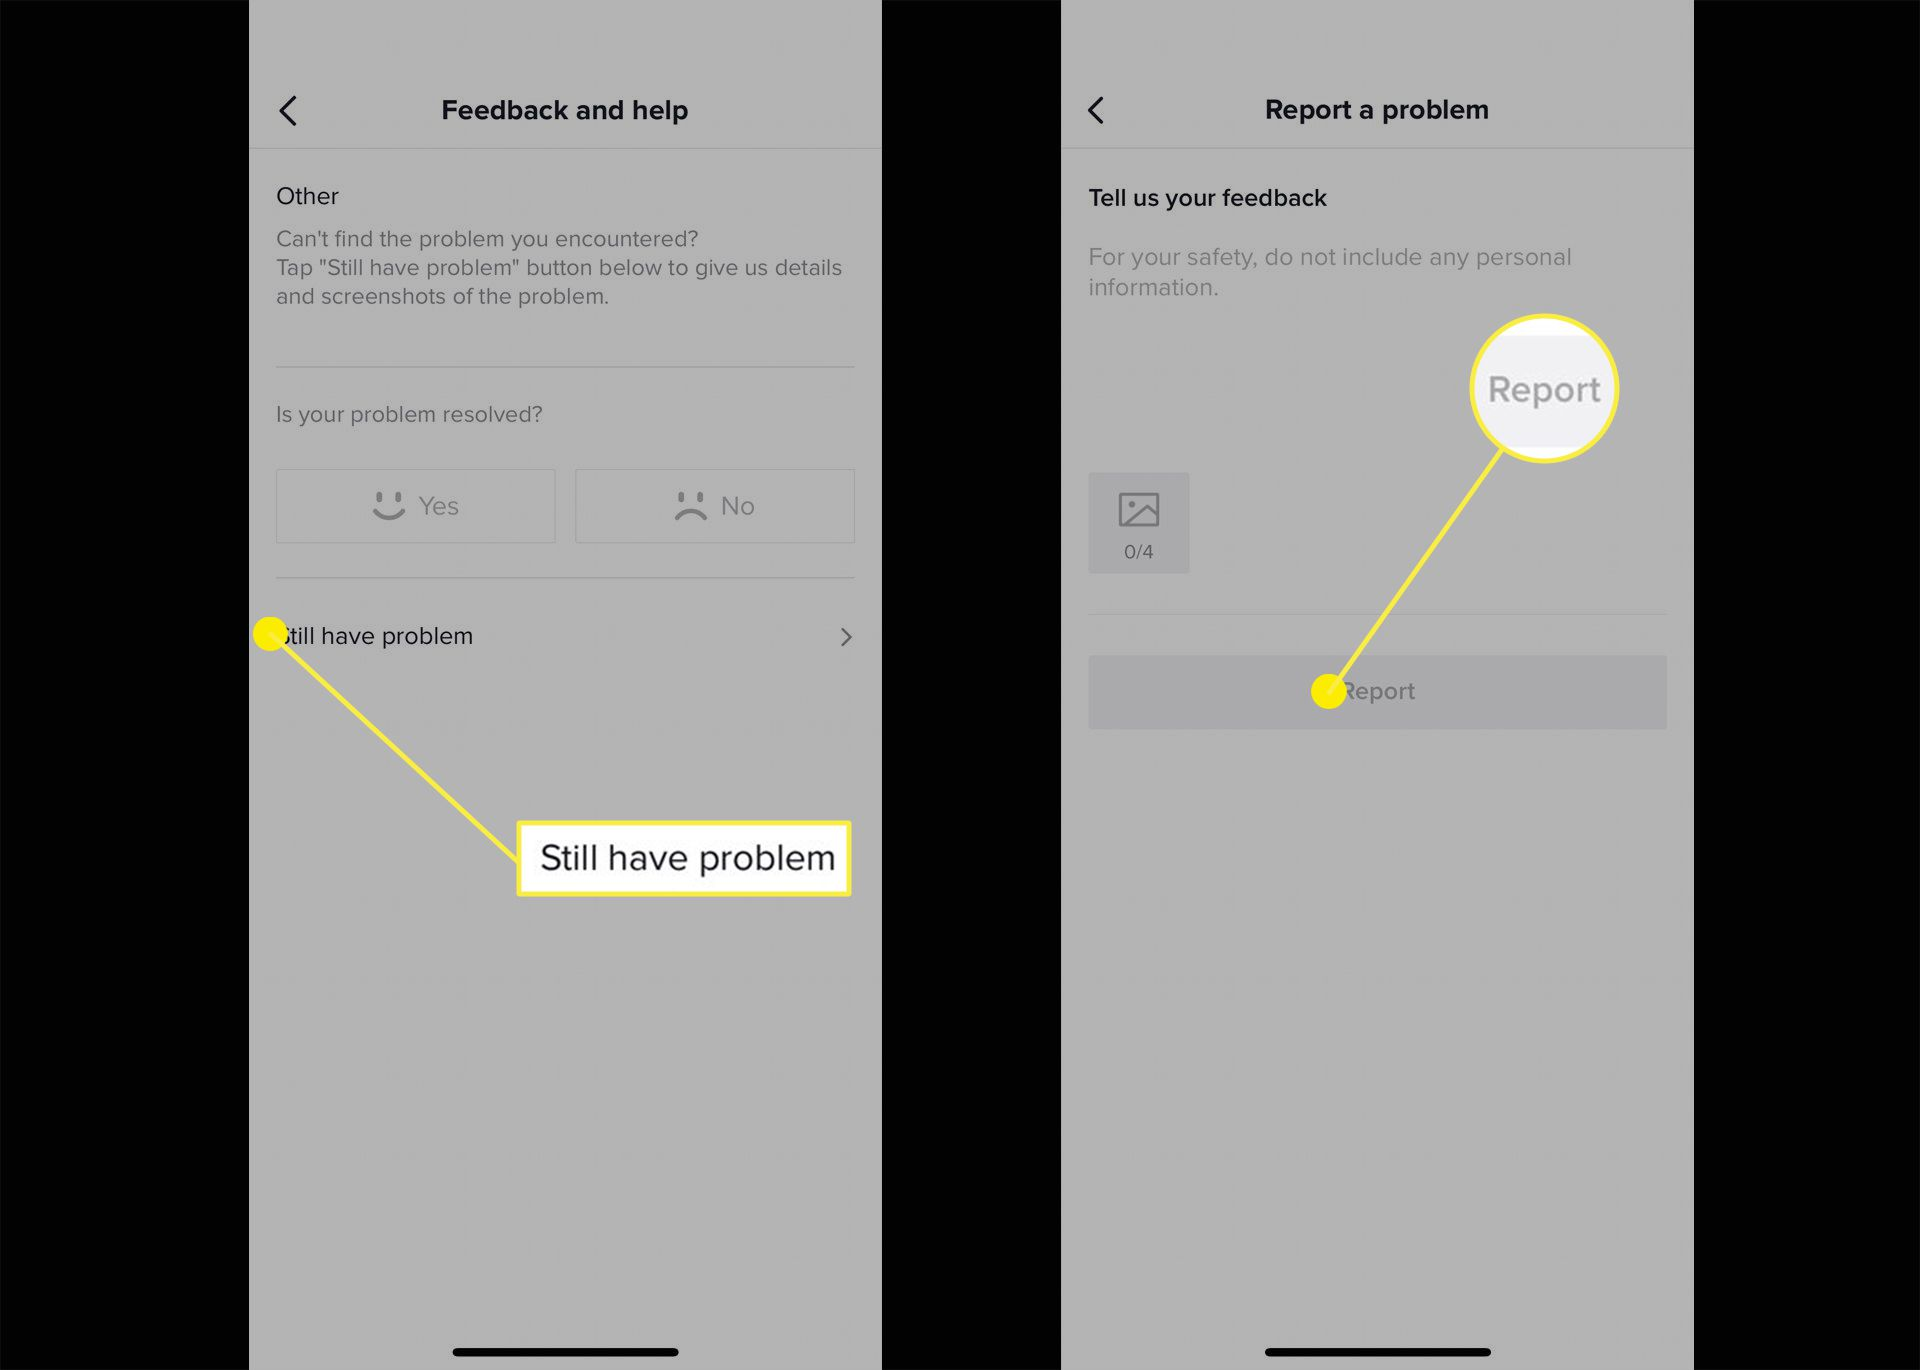 Screenshots of where to report a problem on TikTok.